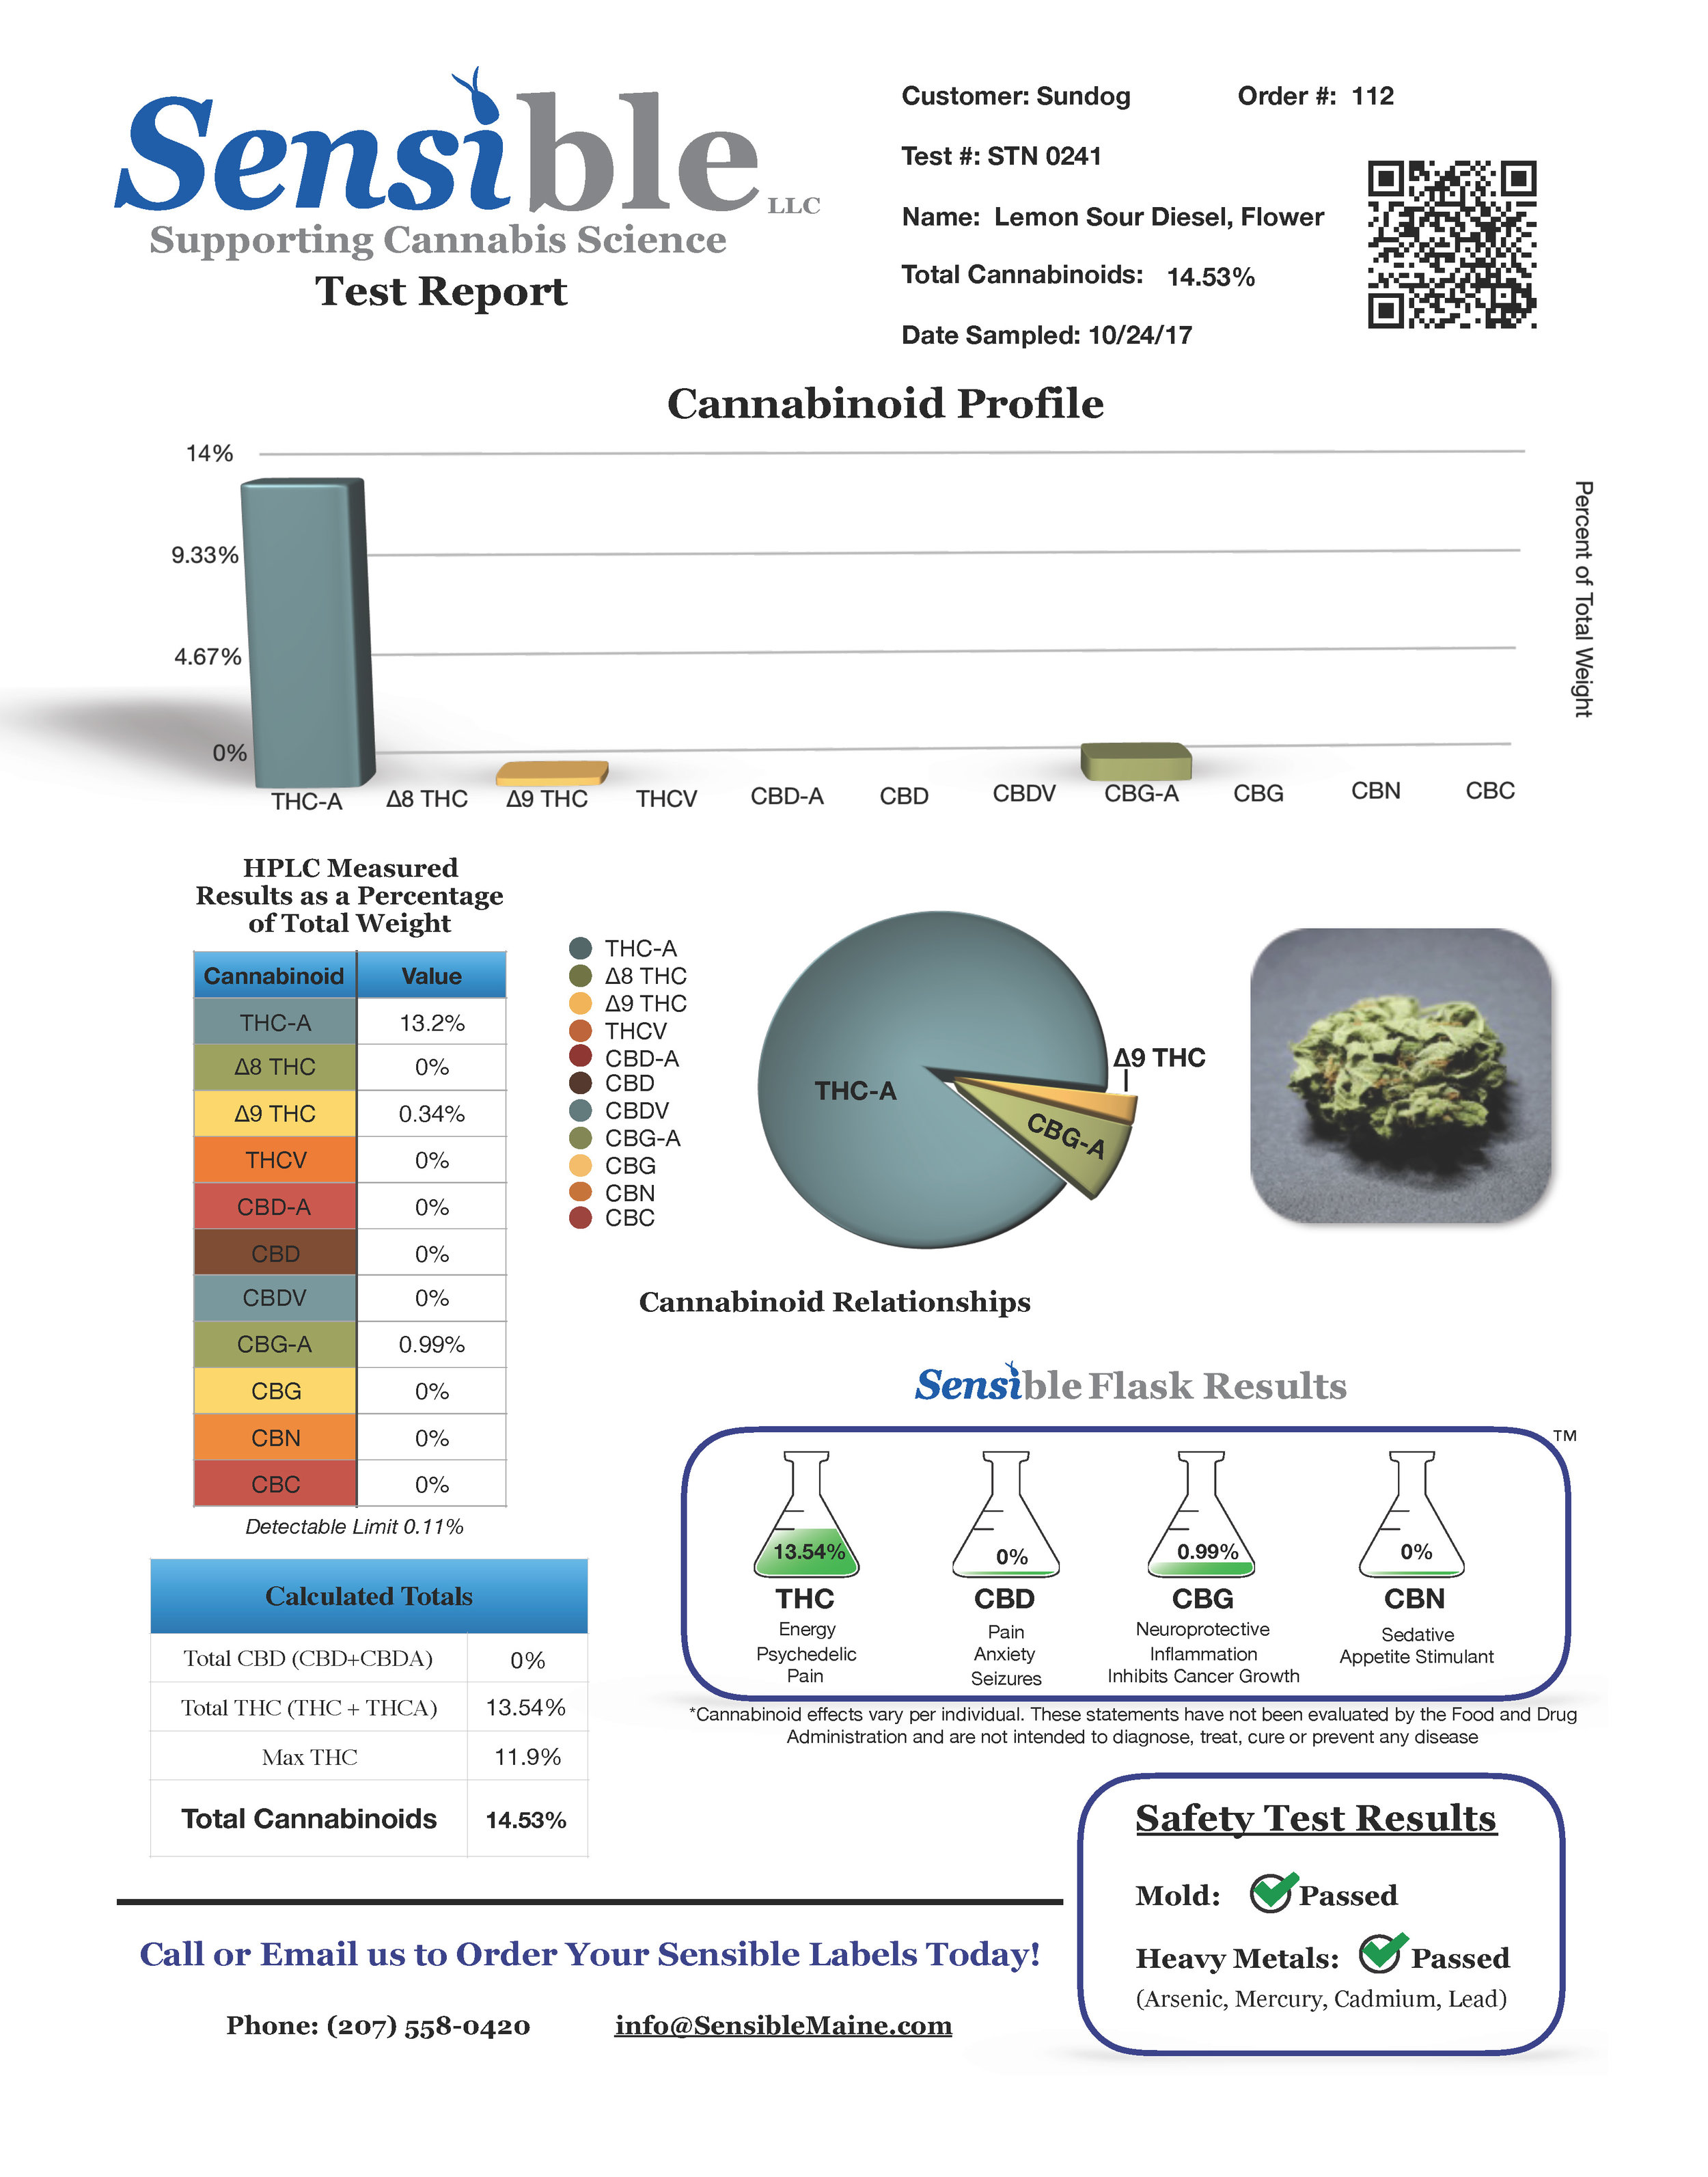 Test Report stn0241.jpg